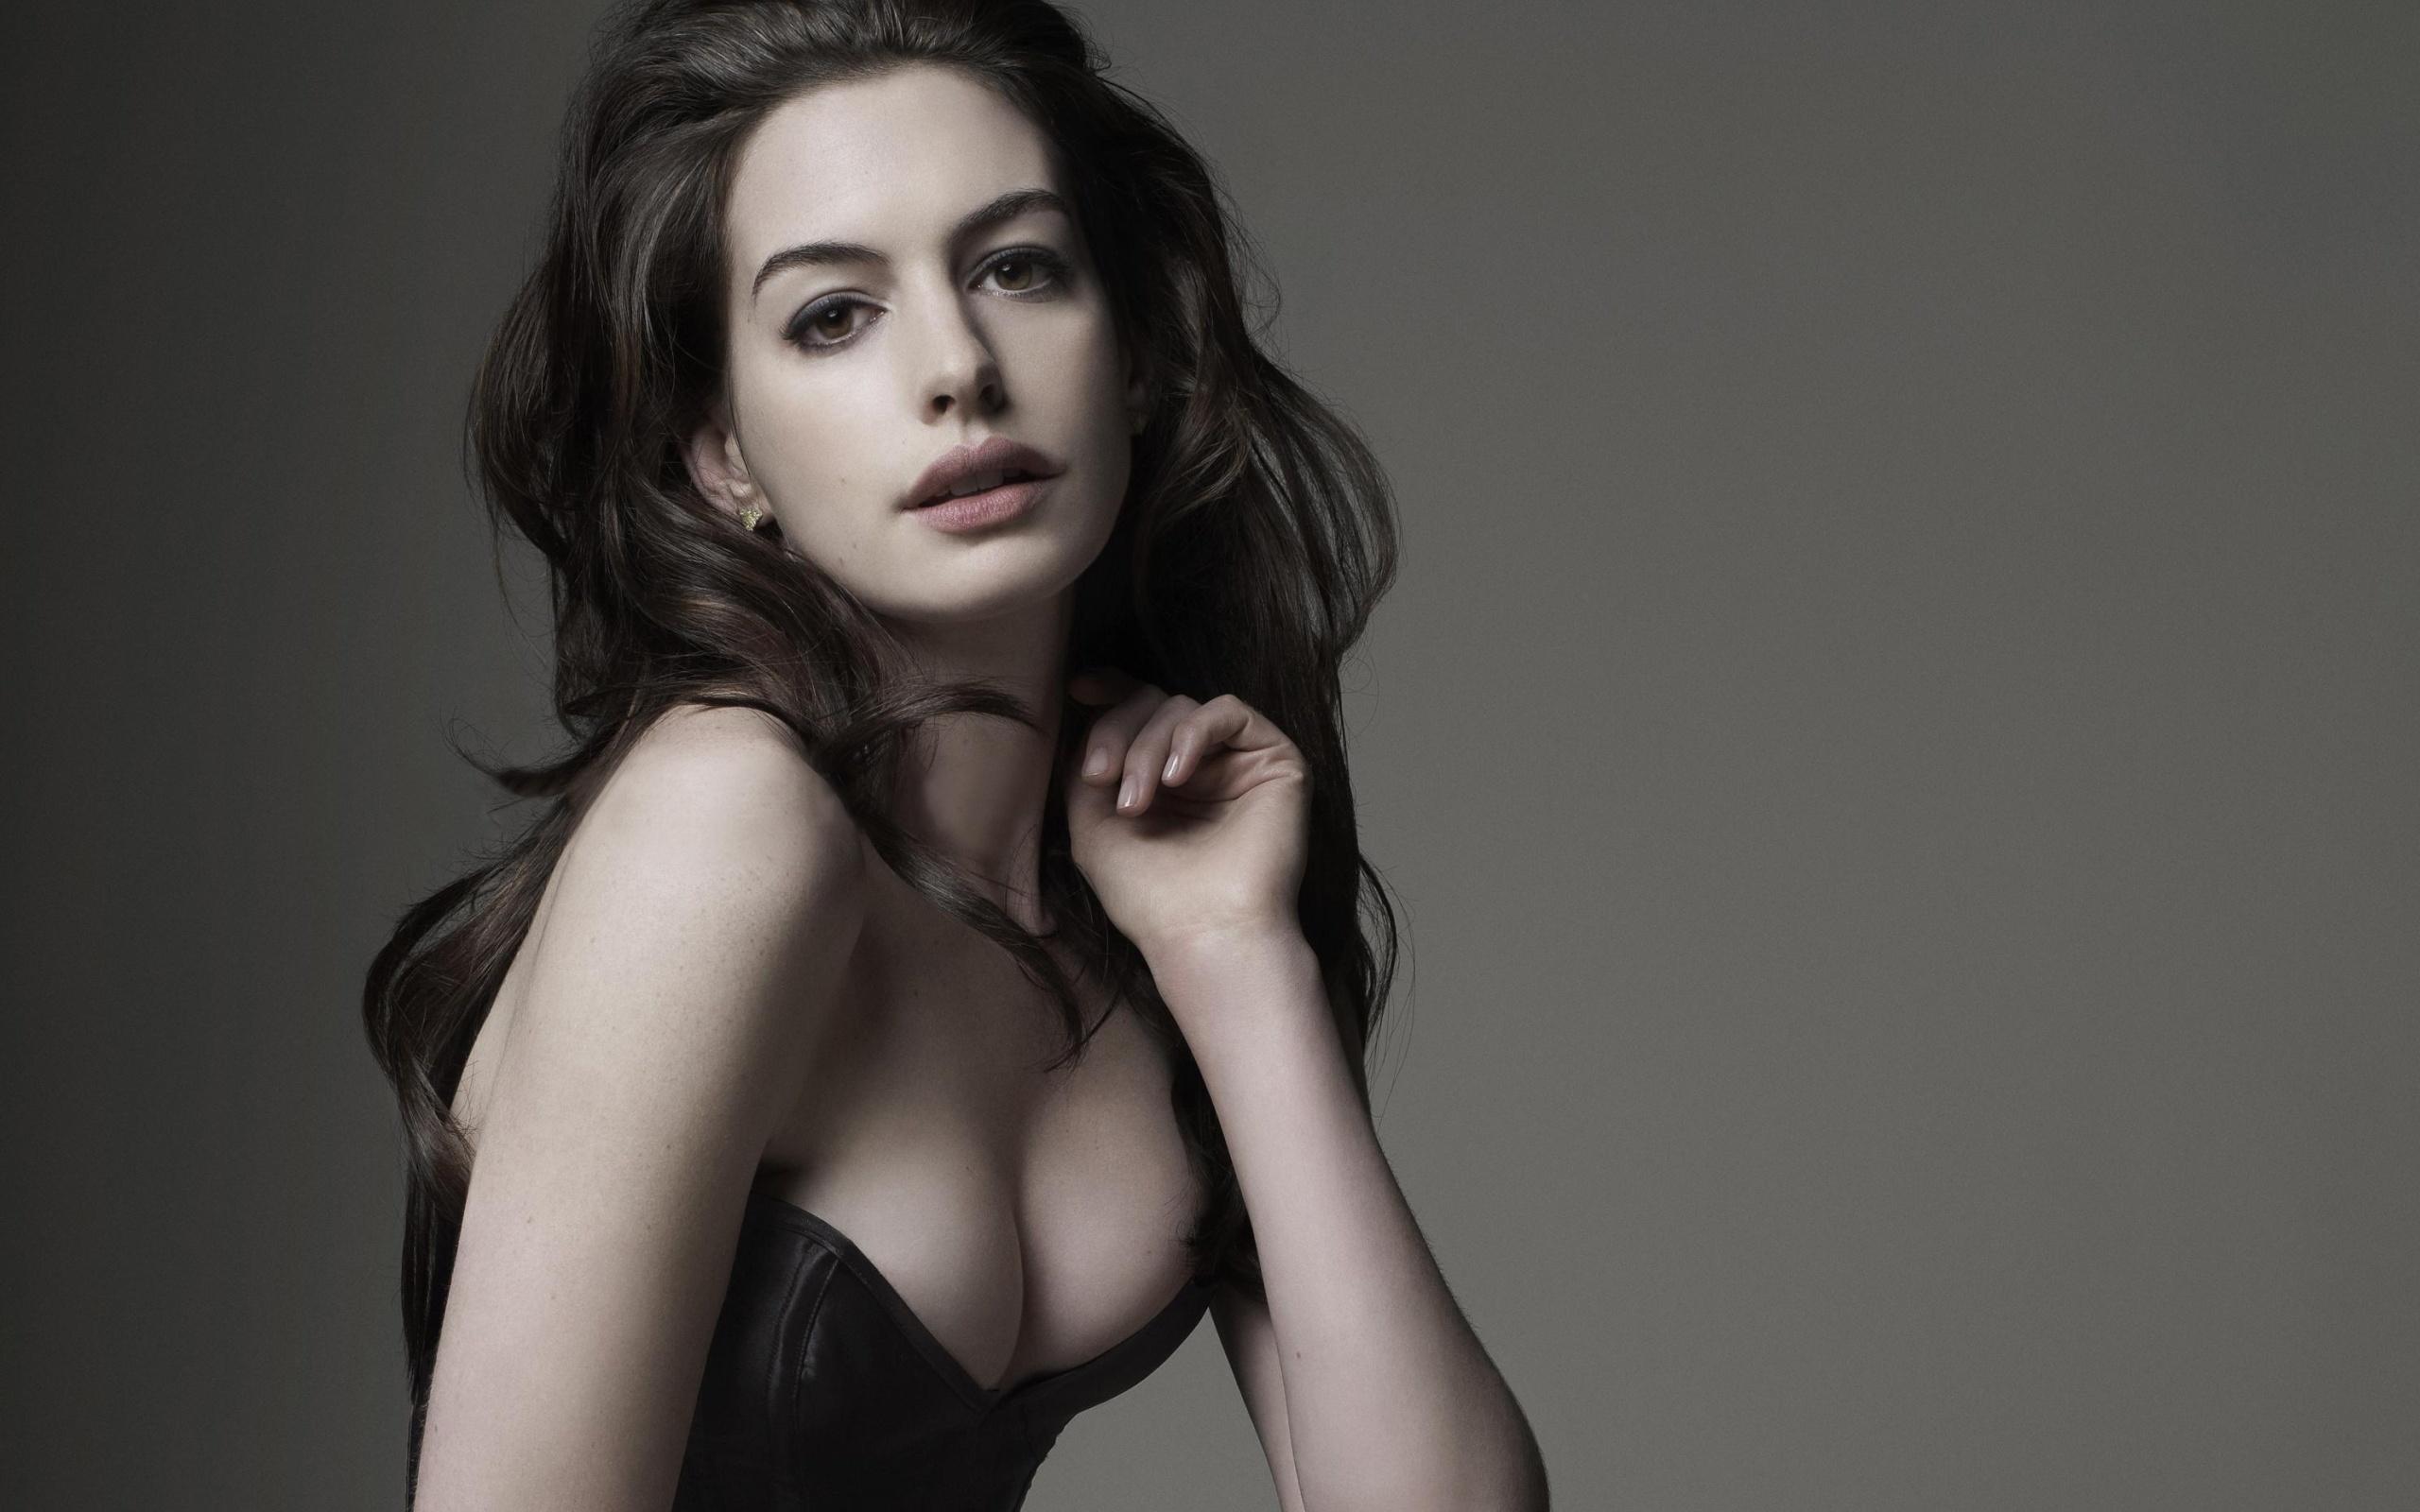 Catwoman tits naked having sex porno image